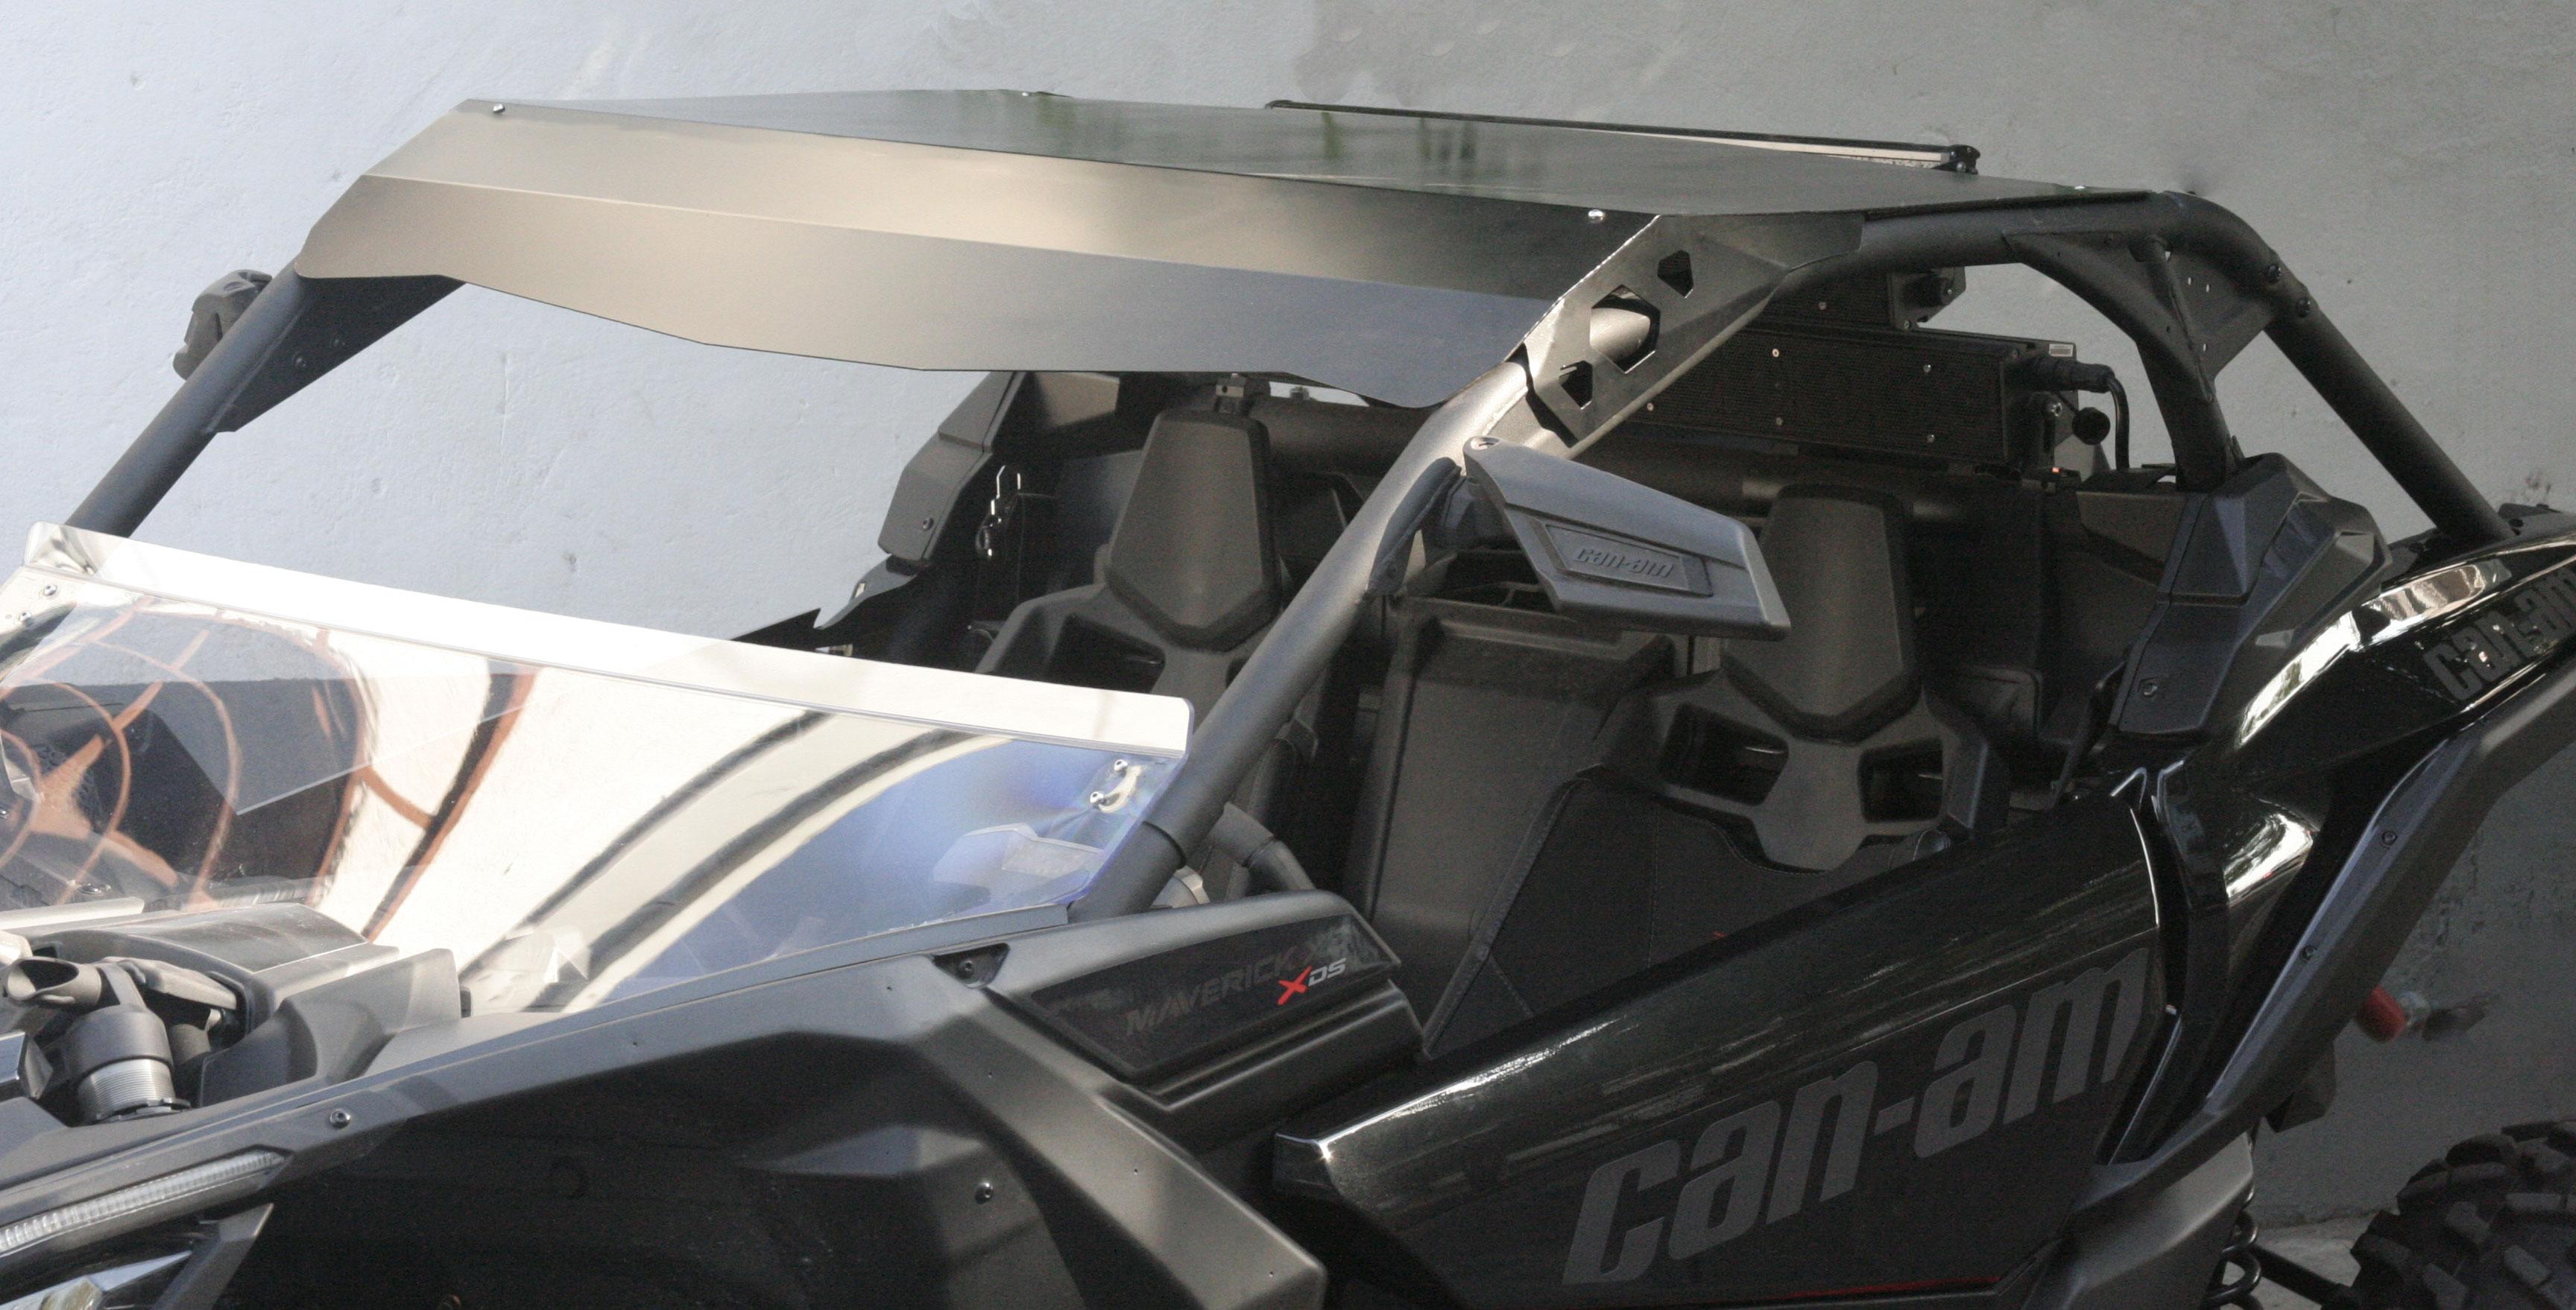 Af1motorsports New Aluminum Roof For Can Am Maverick X3